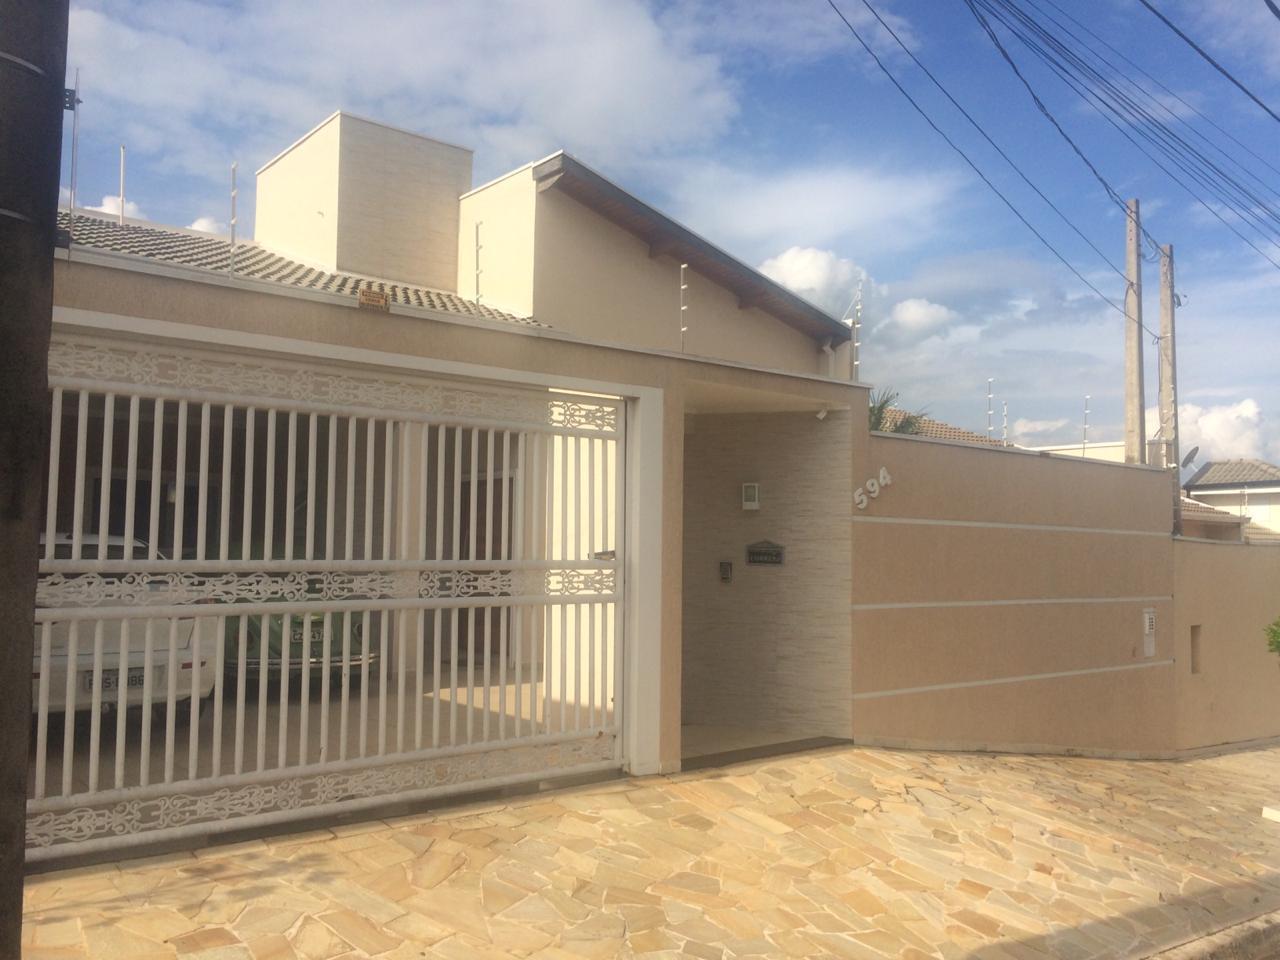 Casa com 3 dormitórios e 1 suíte, no Jardim Esplanada II - Indaiatuba/SP